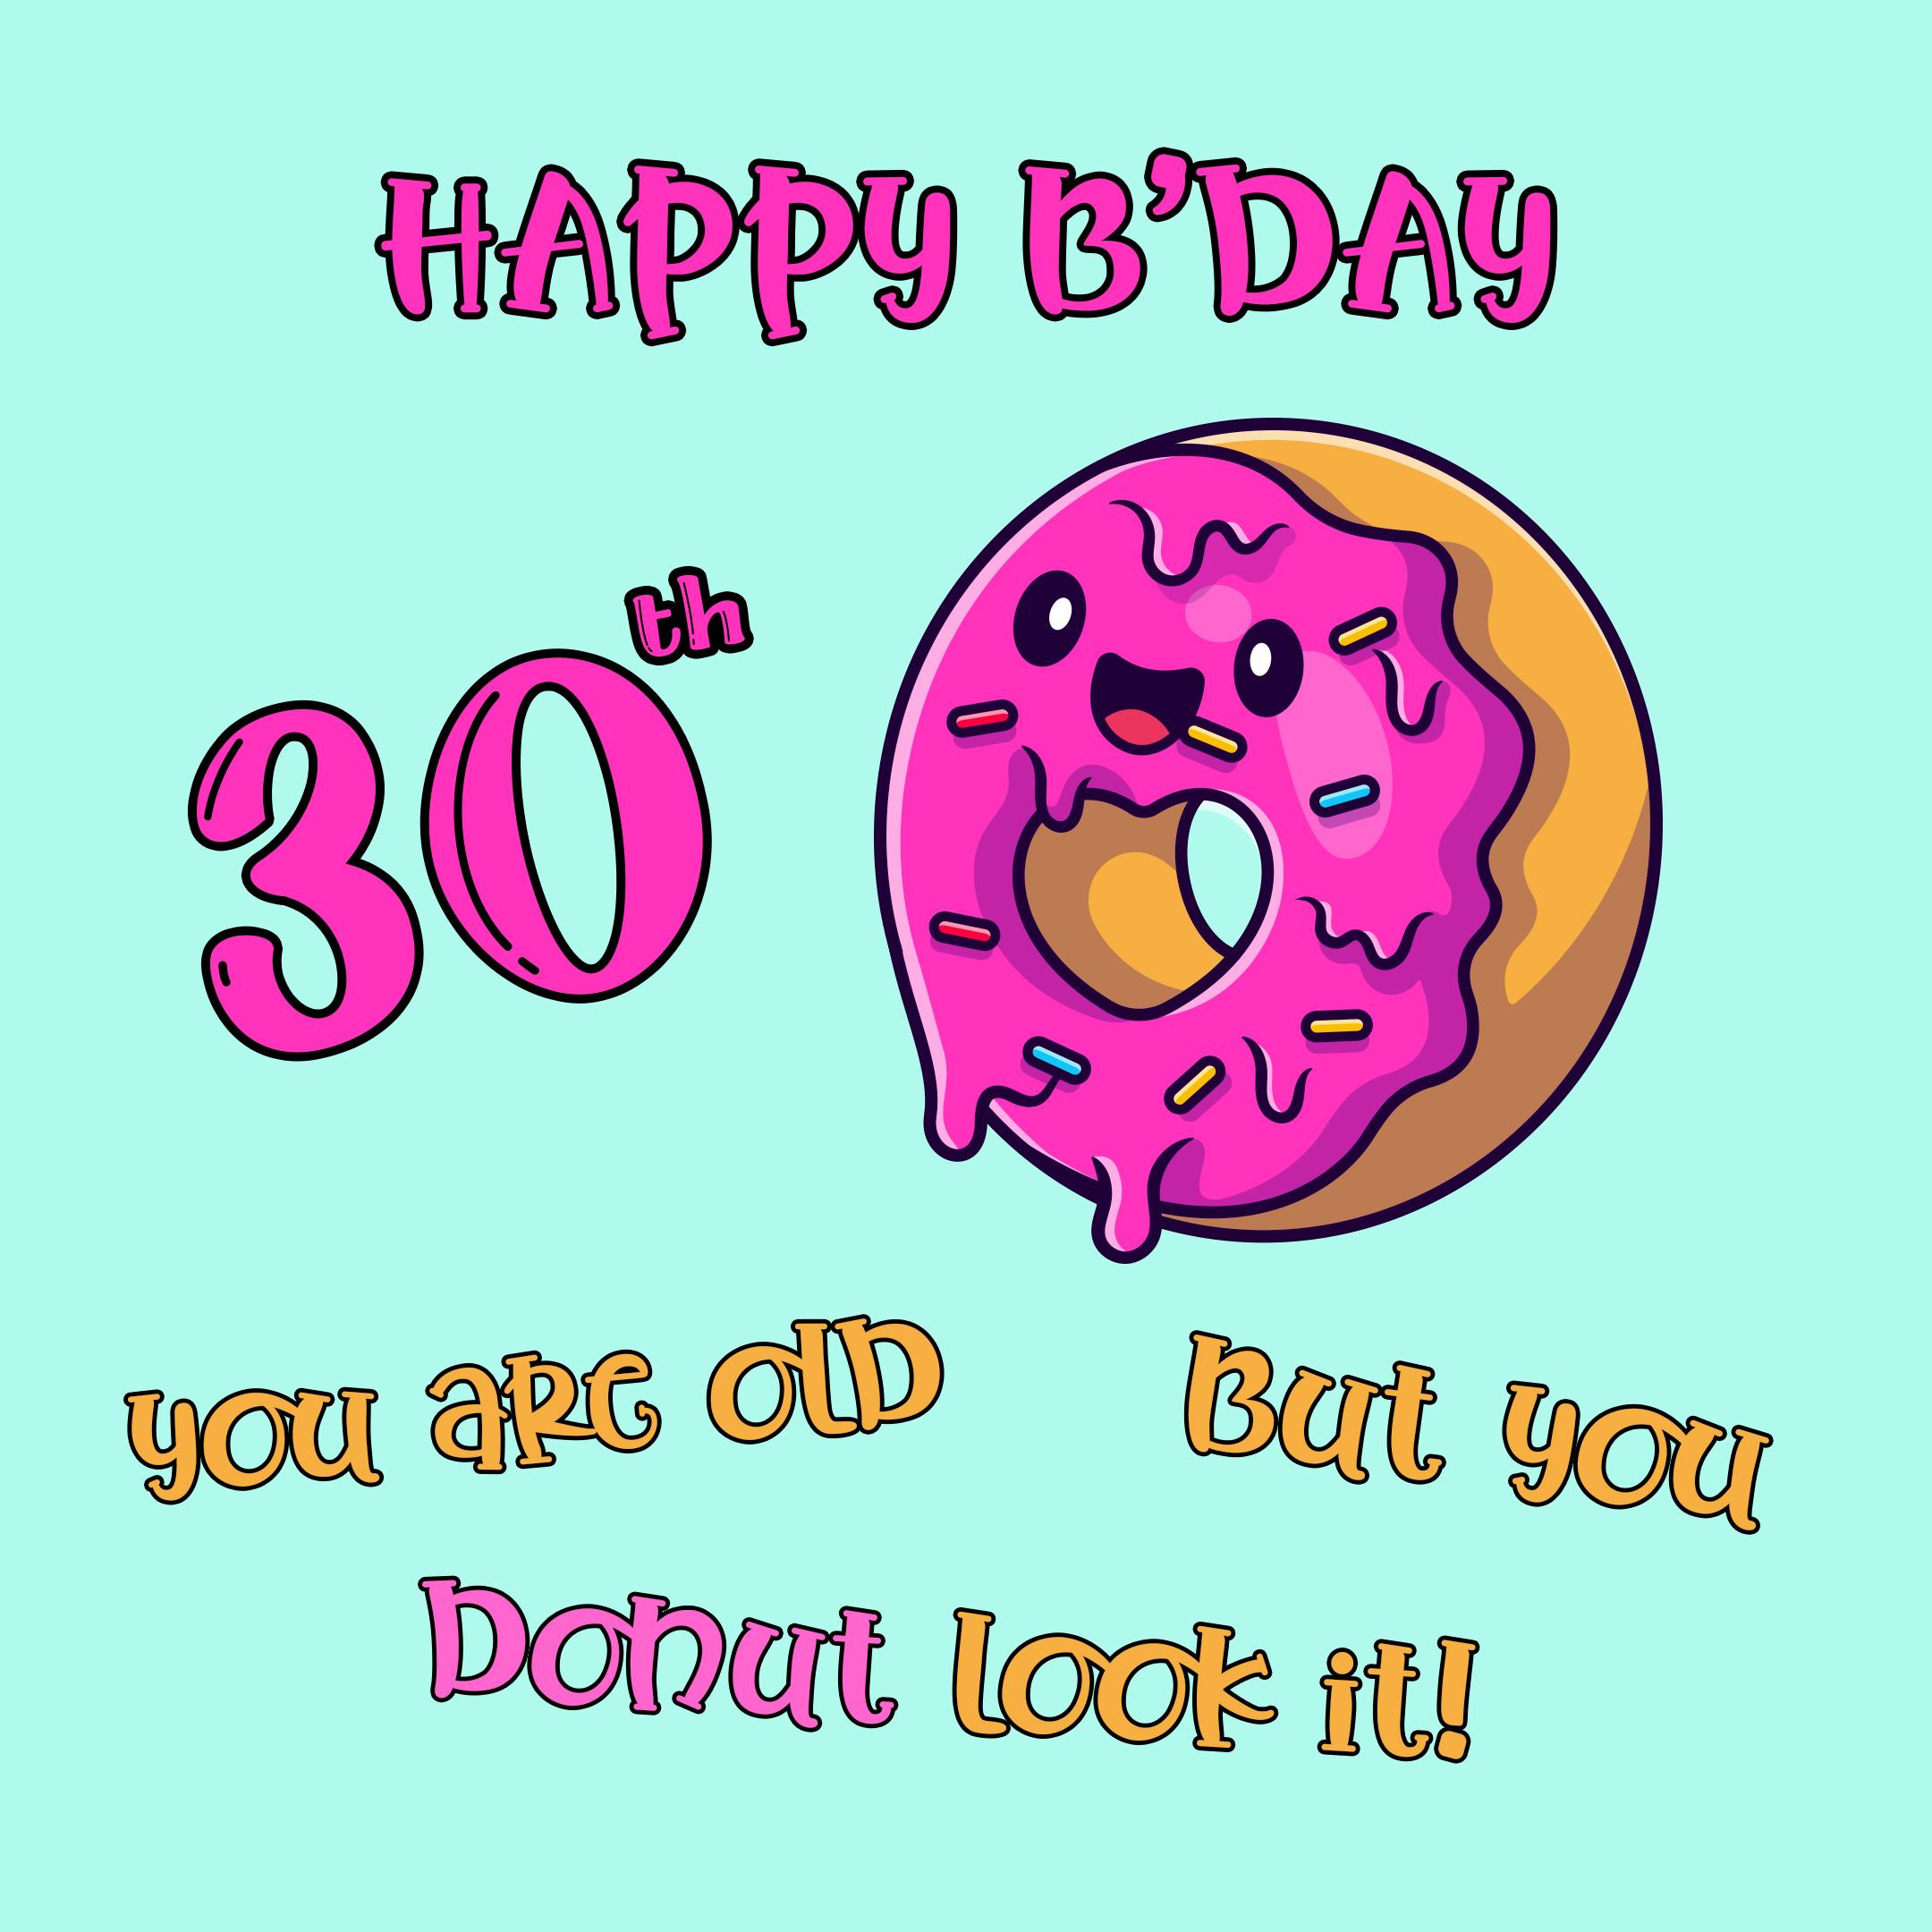 Free Funny 30th Years Happy Birthday Image With Donut - birthdayimg.com